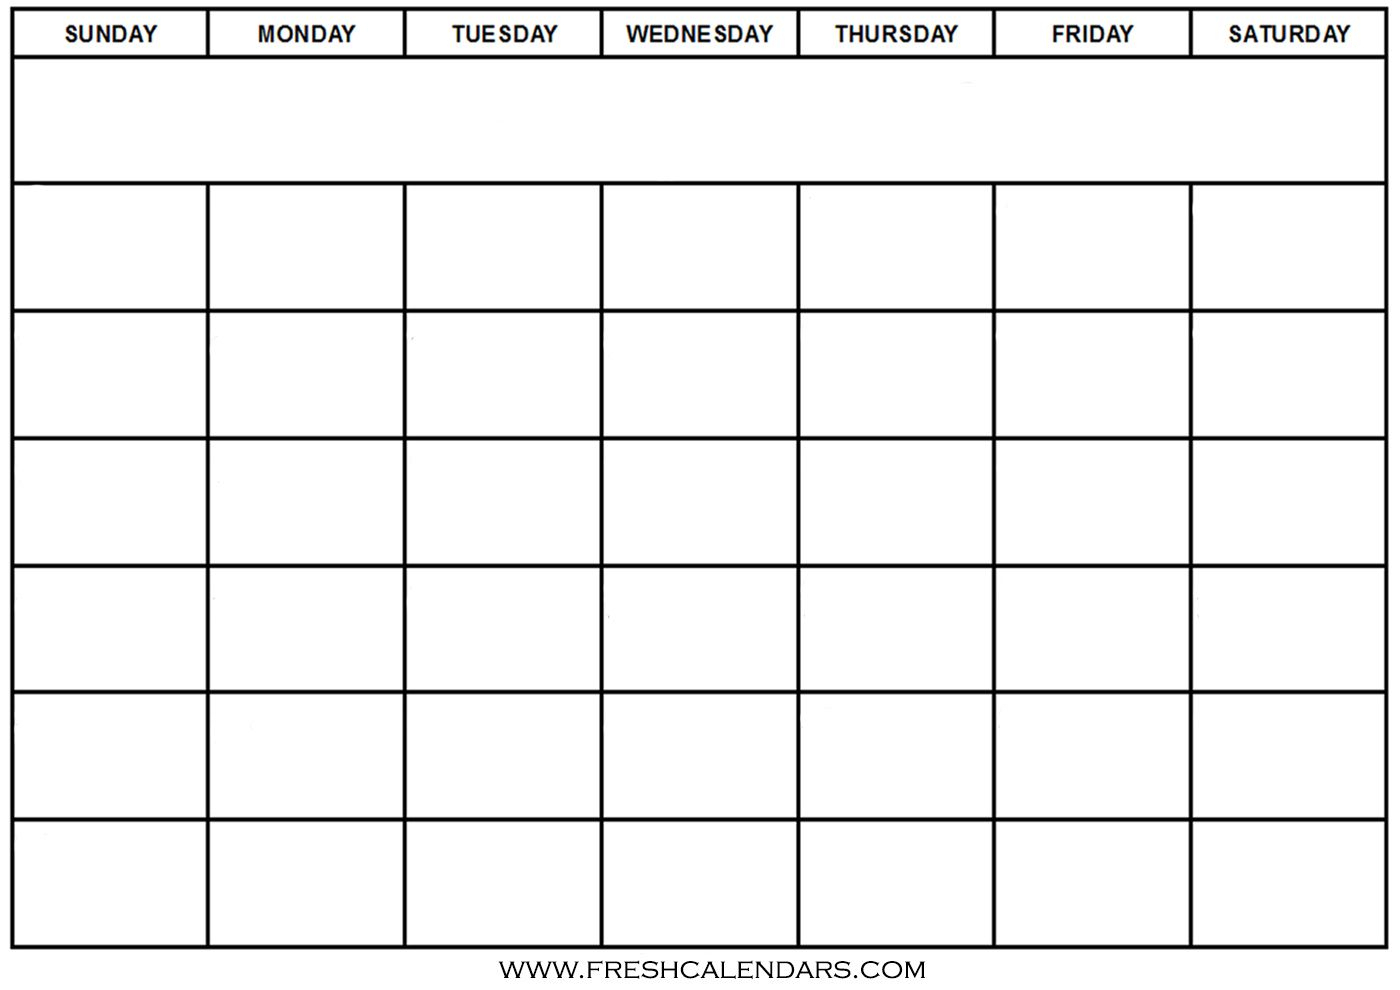 Generic Calendar Template - Wpa.wpart.co